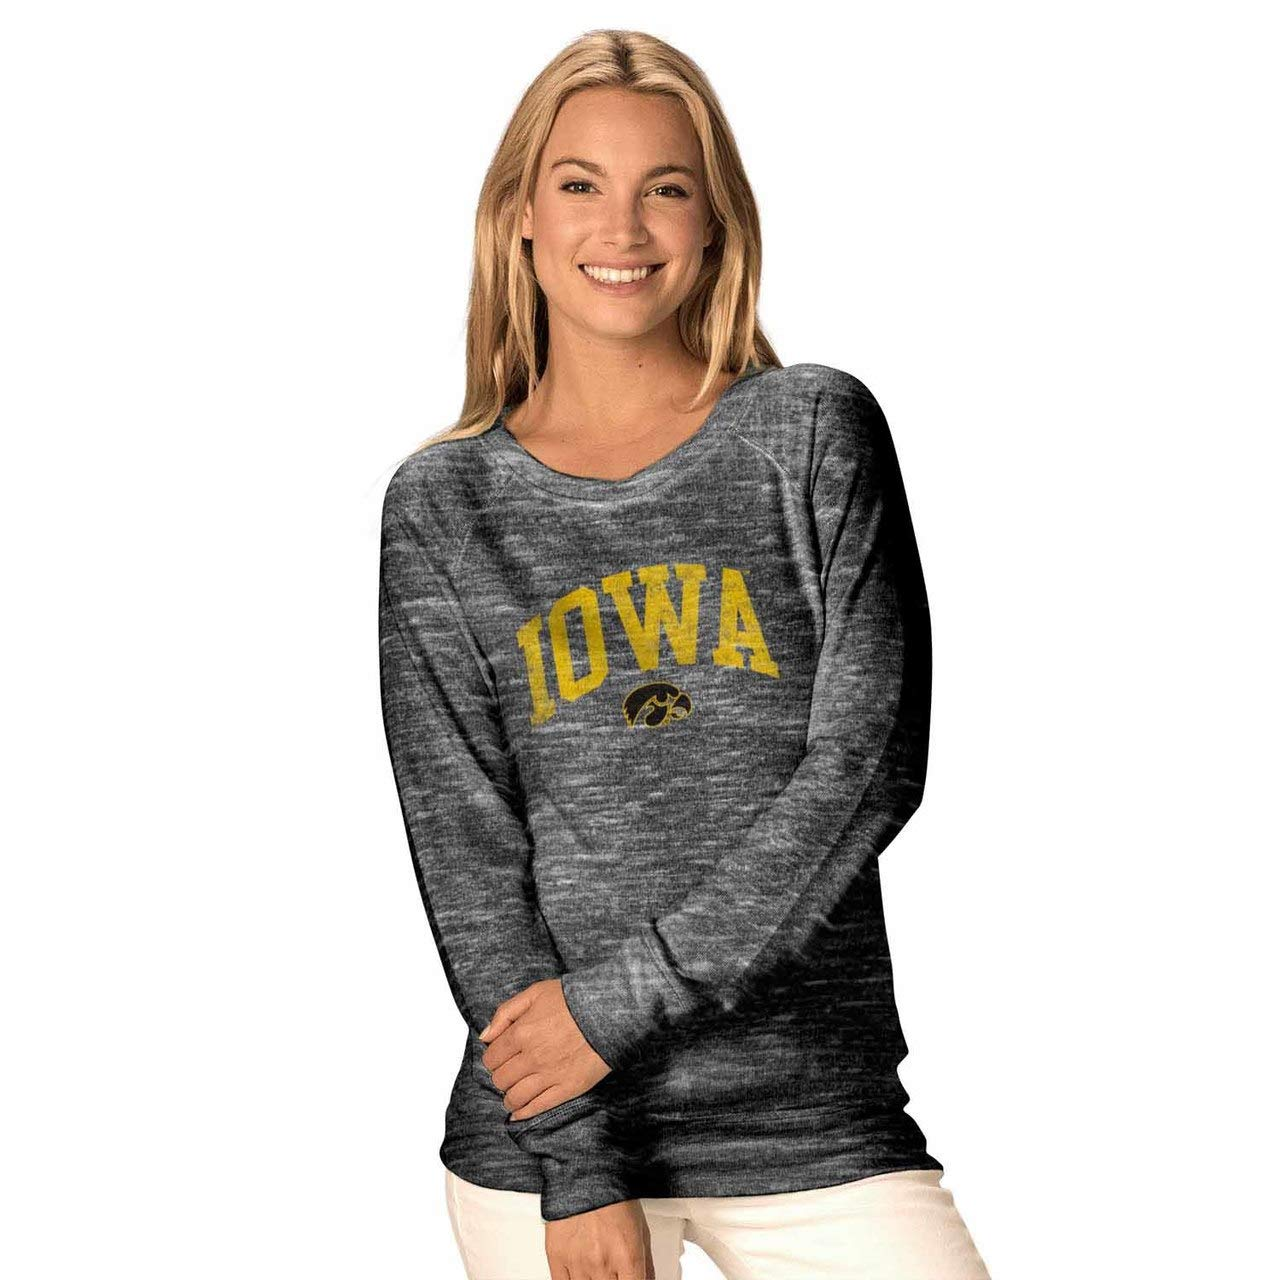 Iowa Hawkeyes  Black Camp David NCAA Womens Ultimate Lightweight Carefree Crewneck  Multiple Teams, Sizes